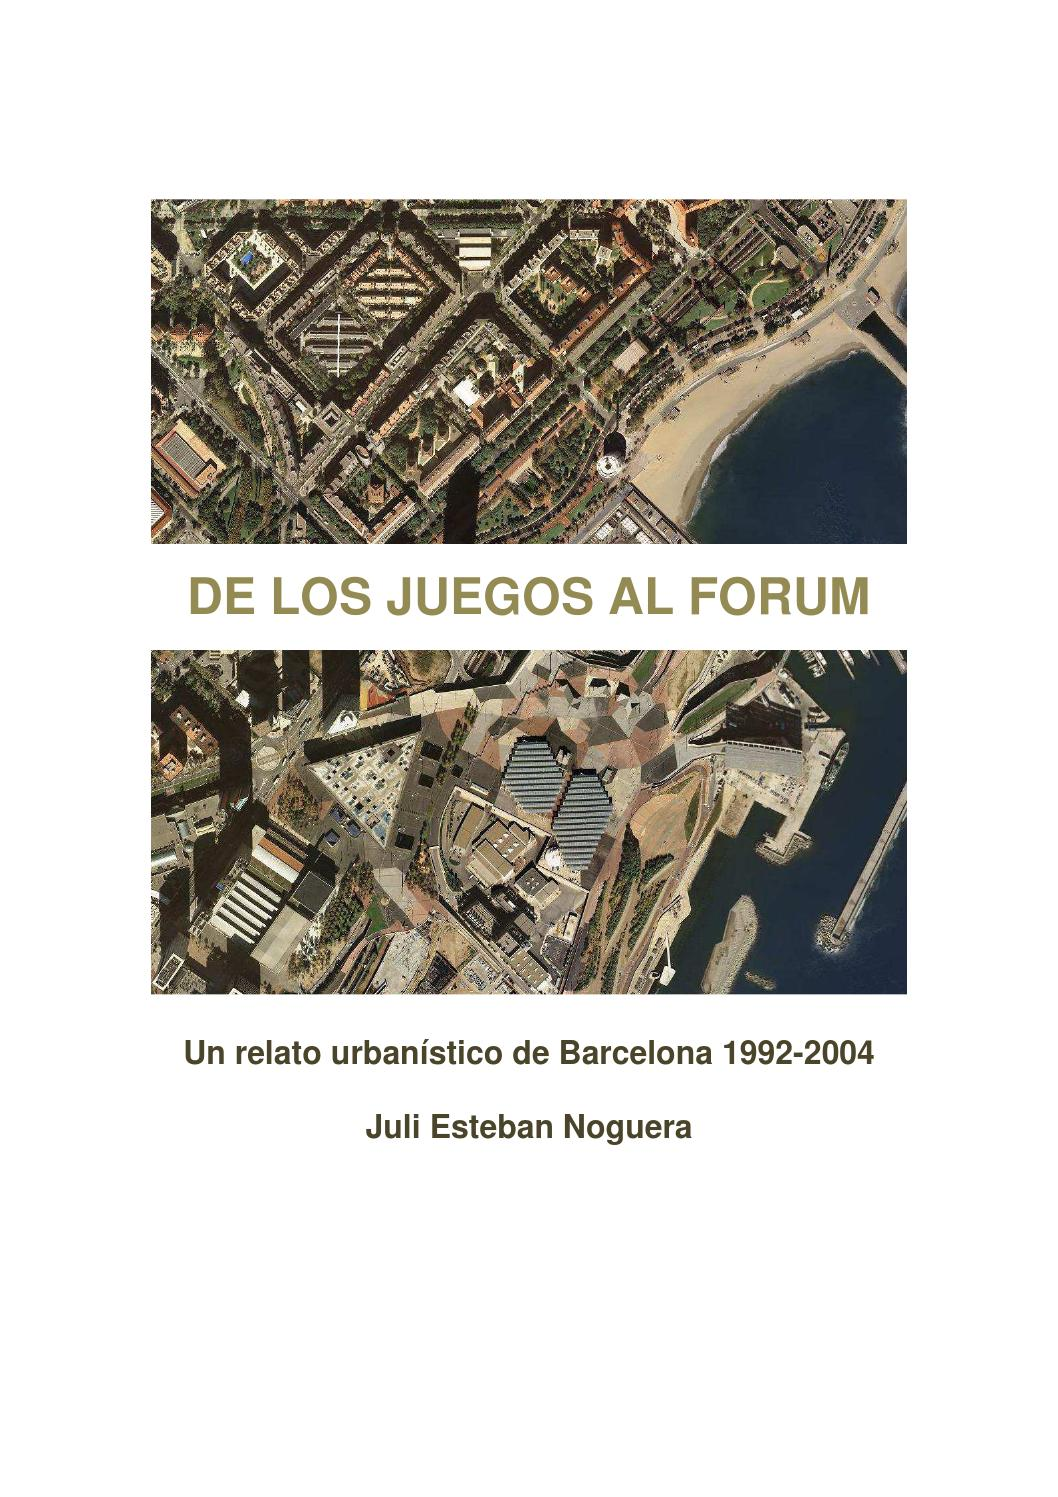 De los juegos al forum - Juli Esteban Noguera by Cooperativa Jordi Capell -  issuu 50f7db6f657